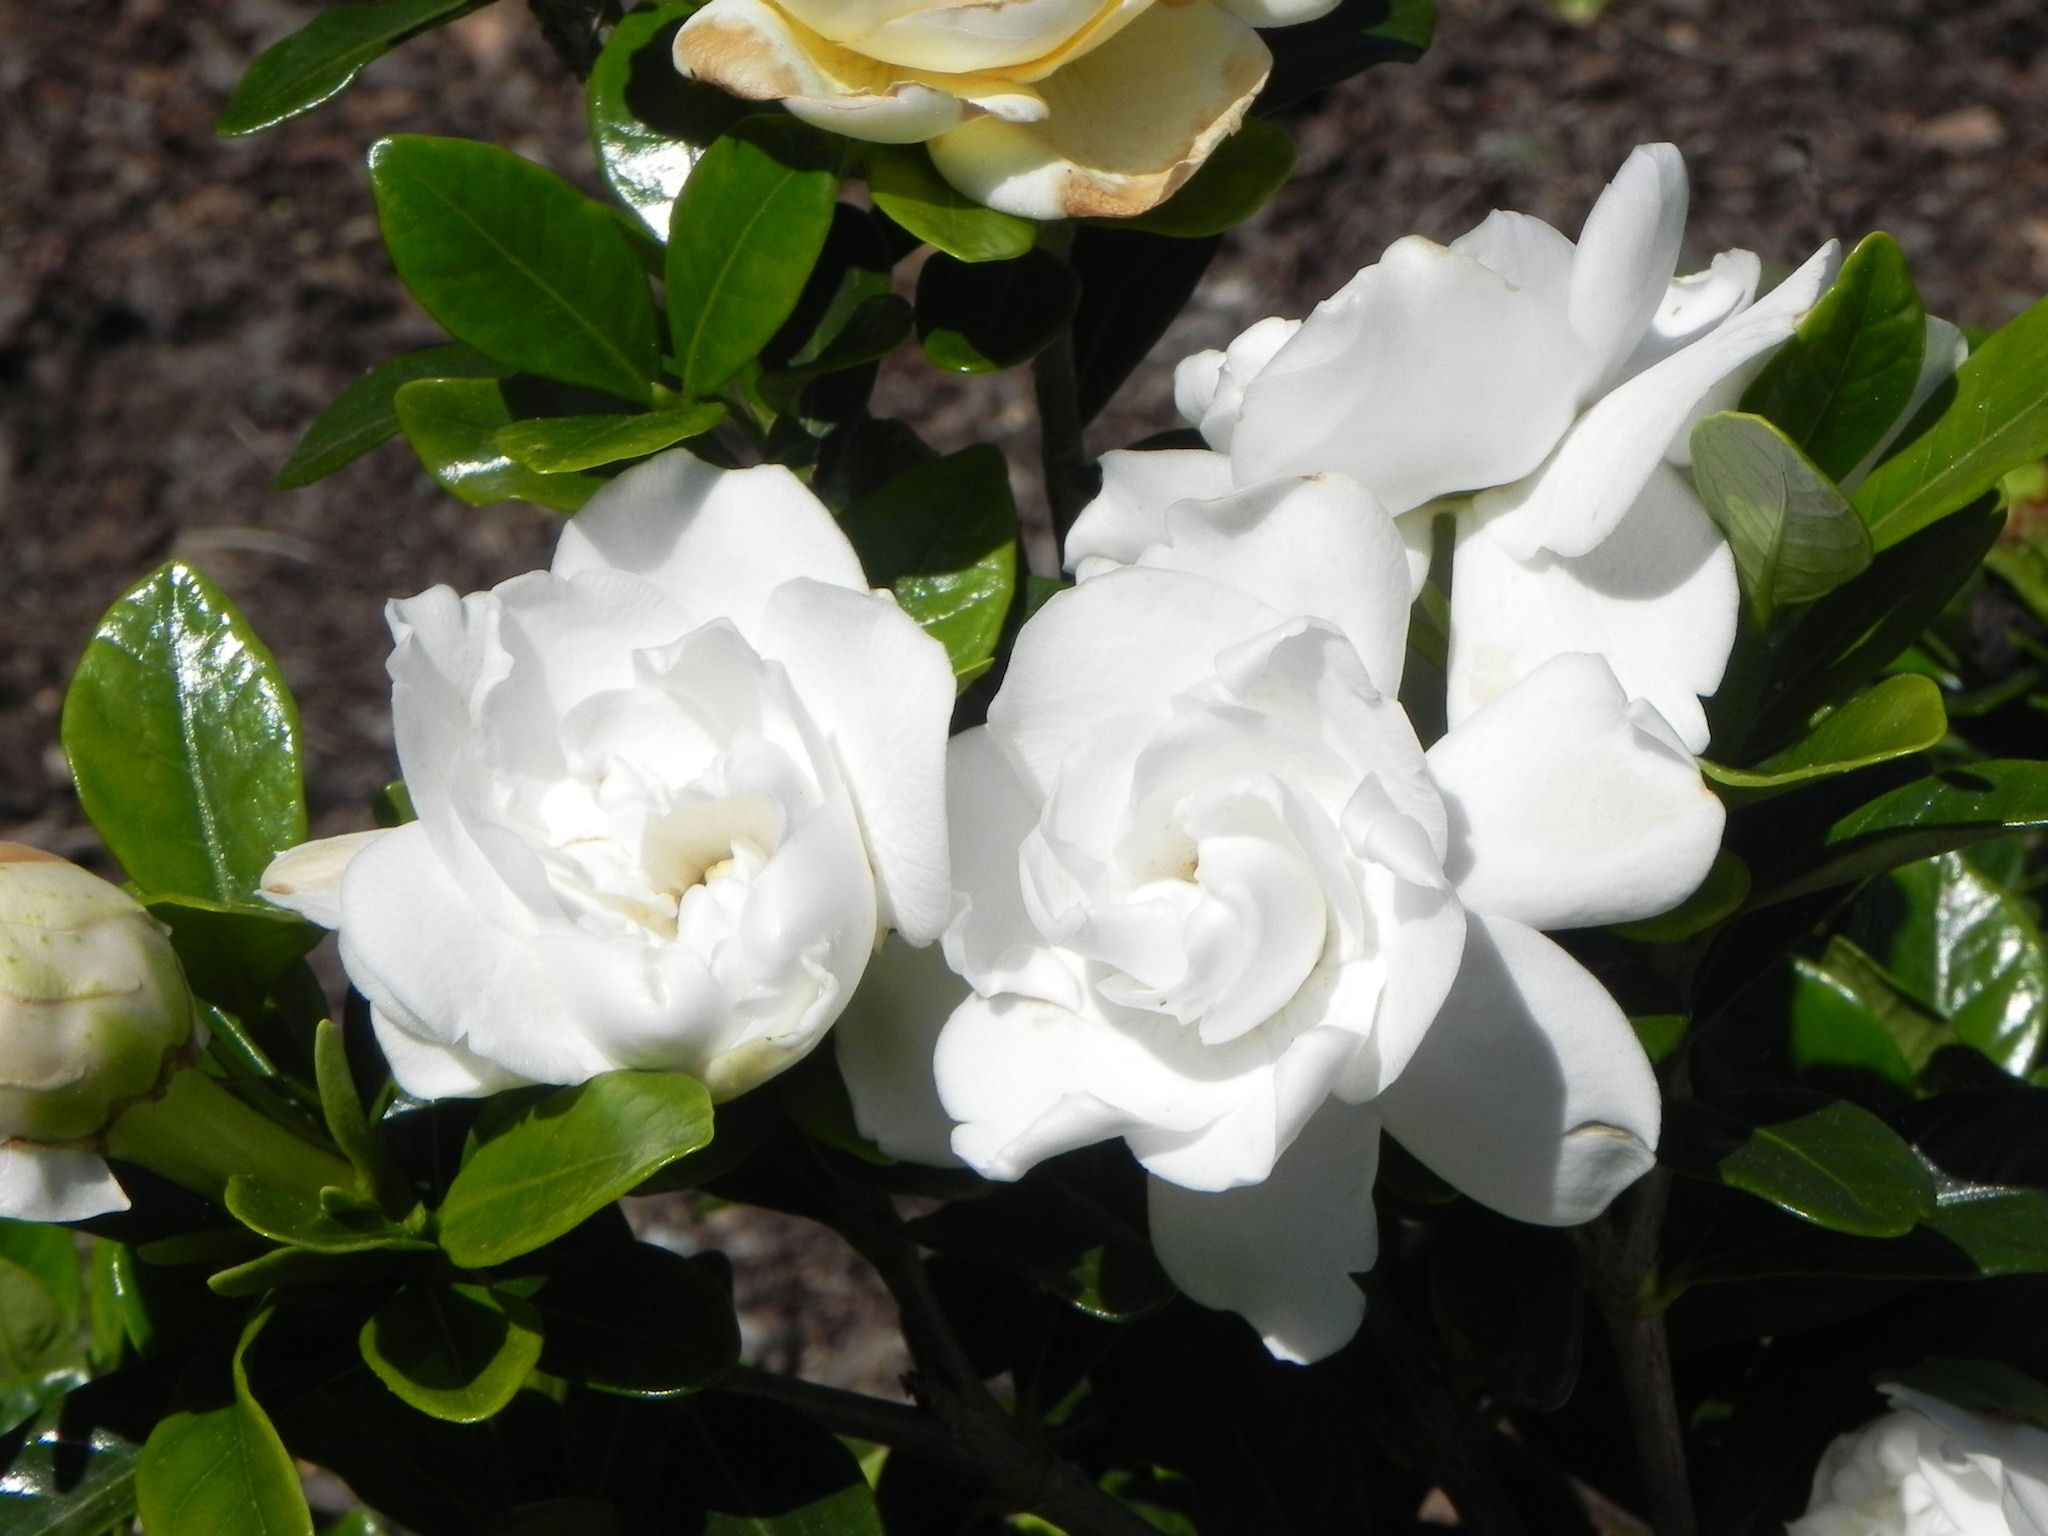 Gardenia Hd Wallpaper Flowers Pinterest Gardenias Flowers And